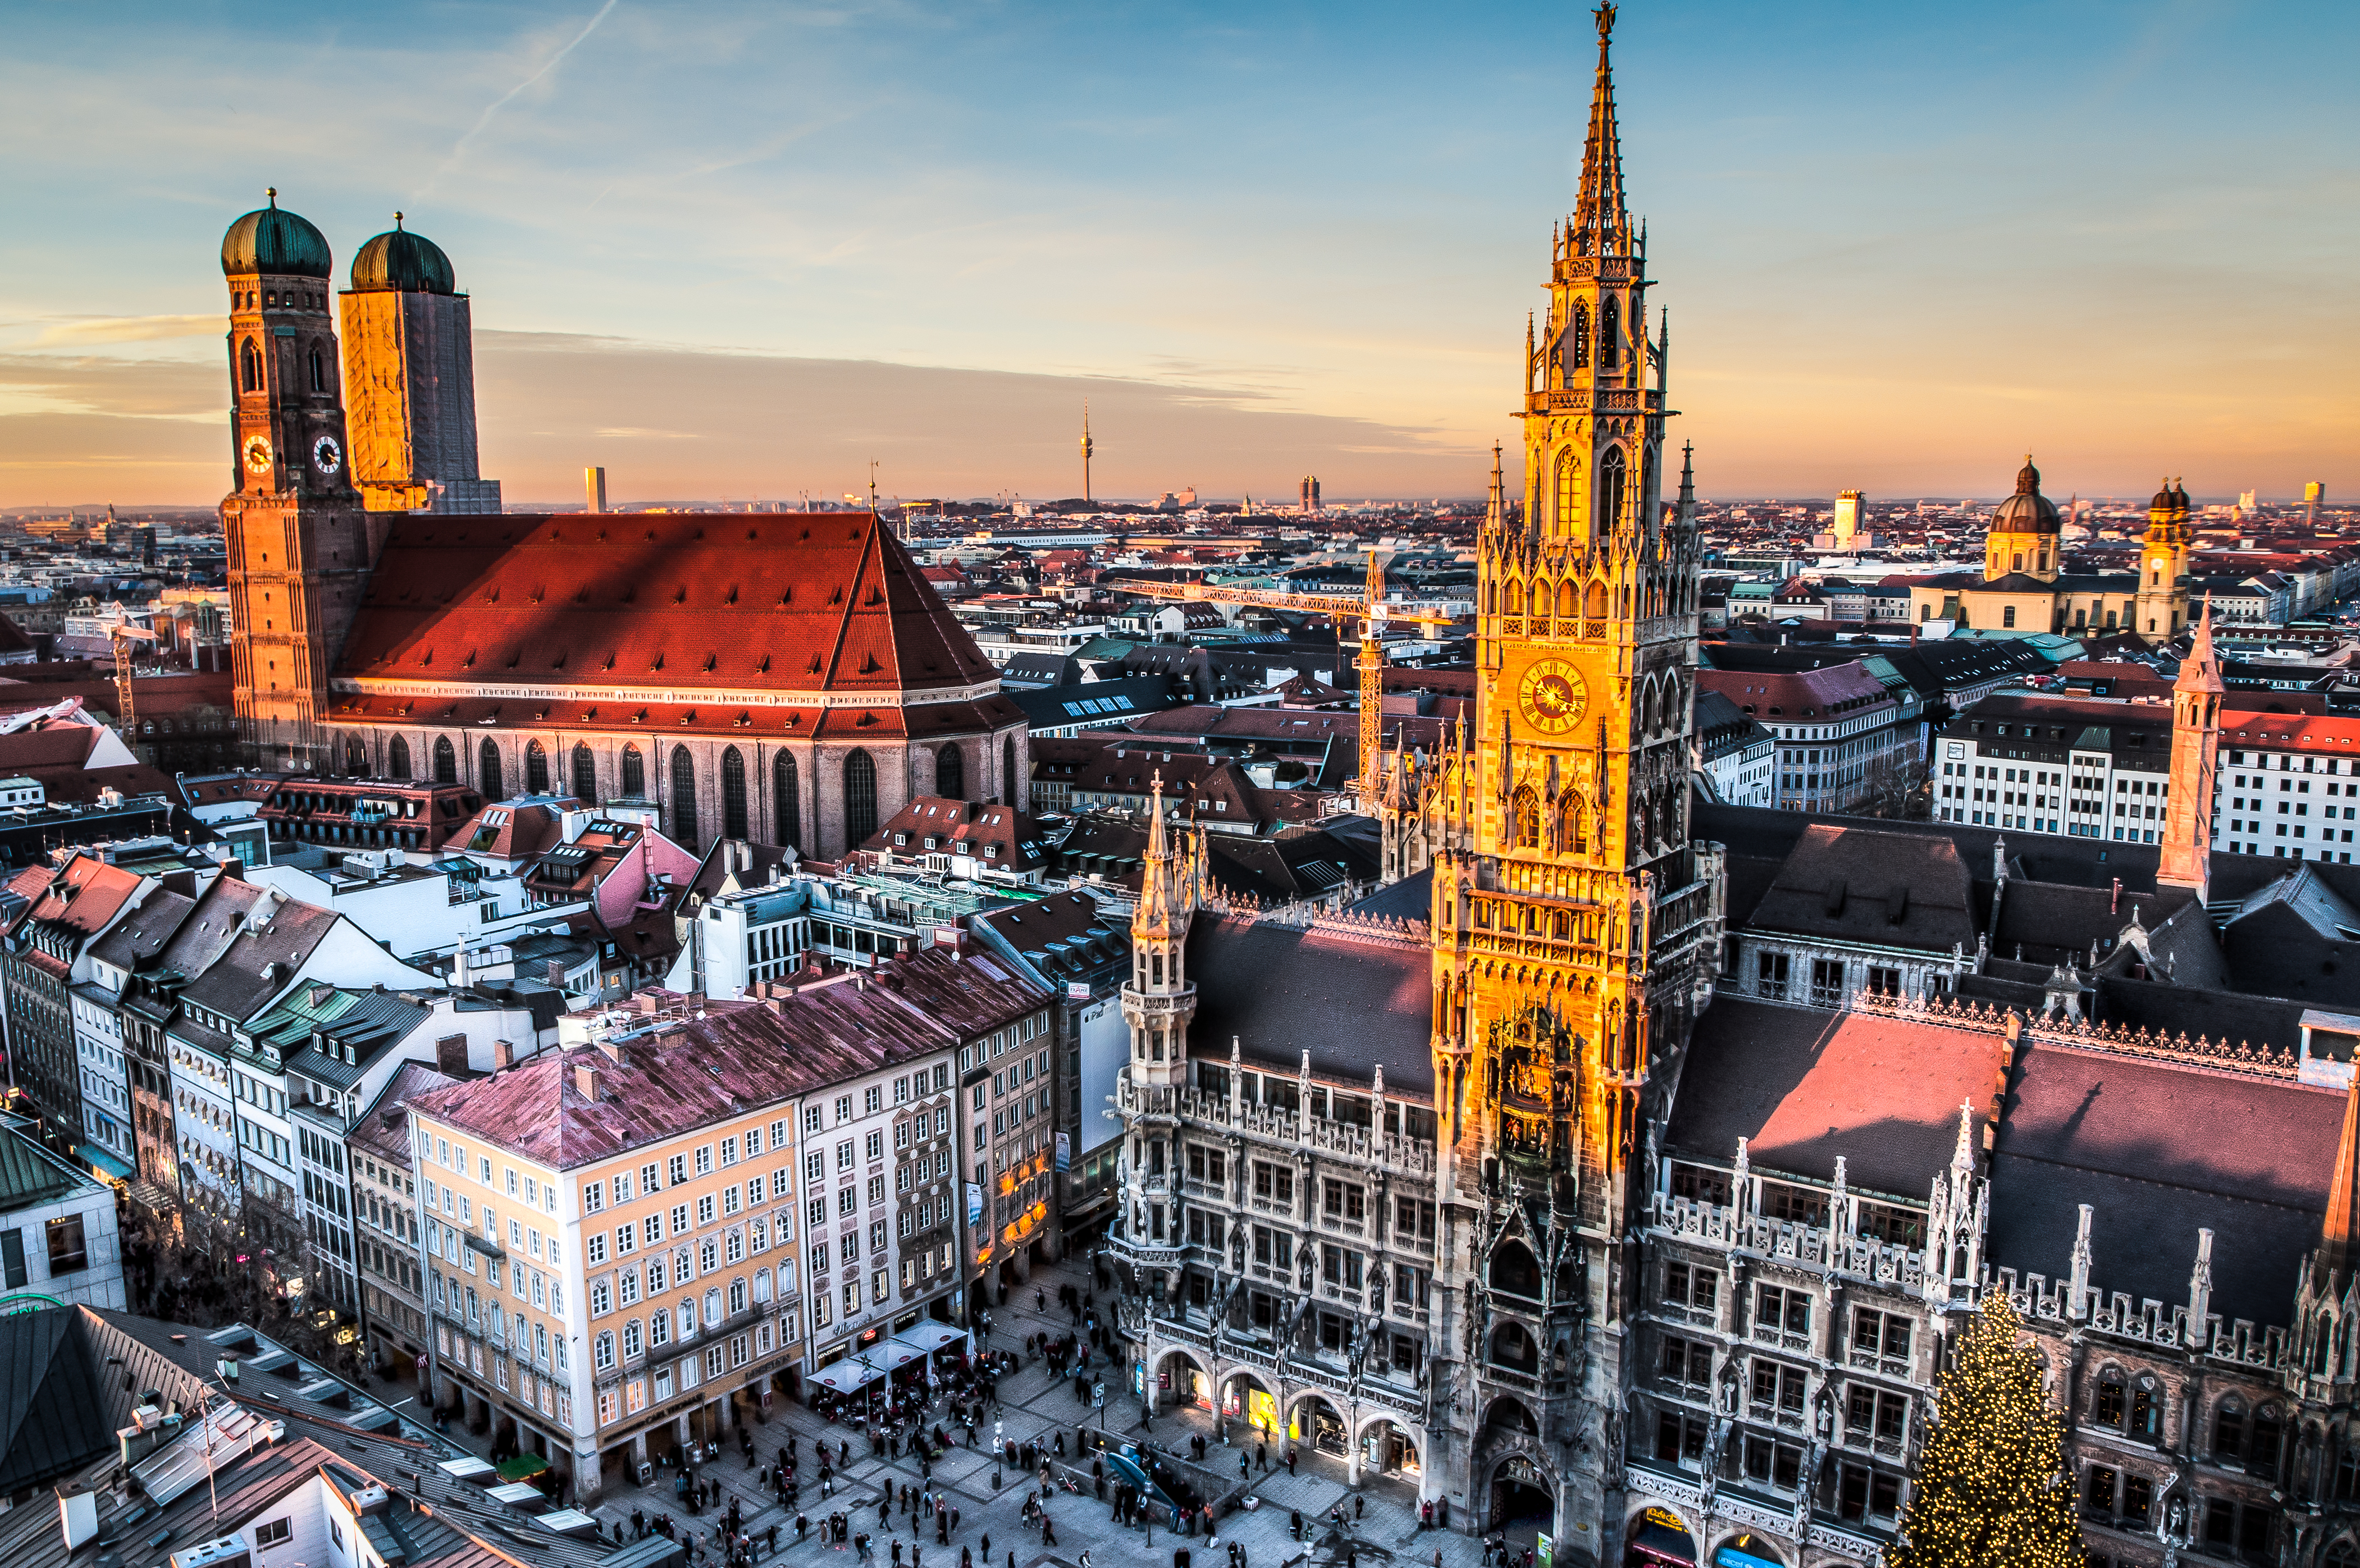 Munich Pics, Man Made Collection